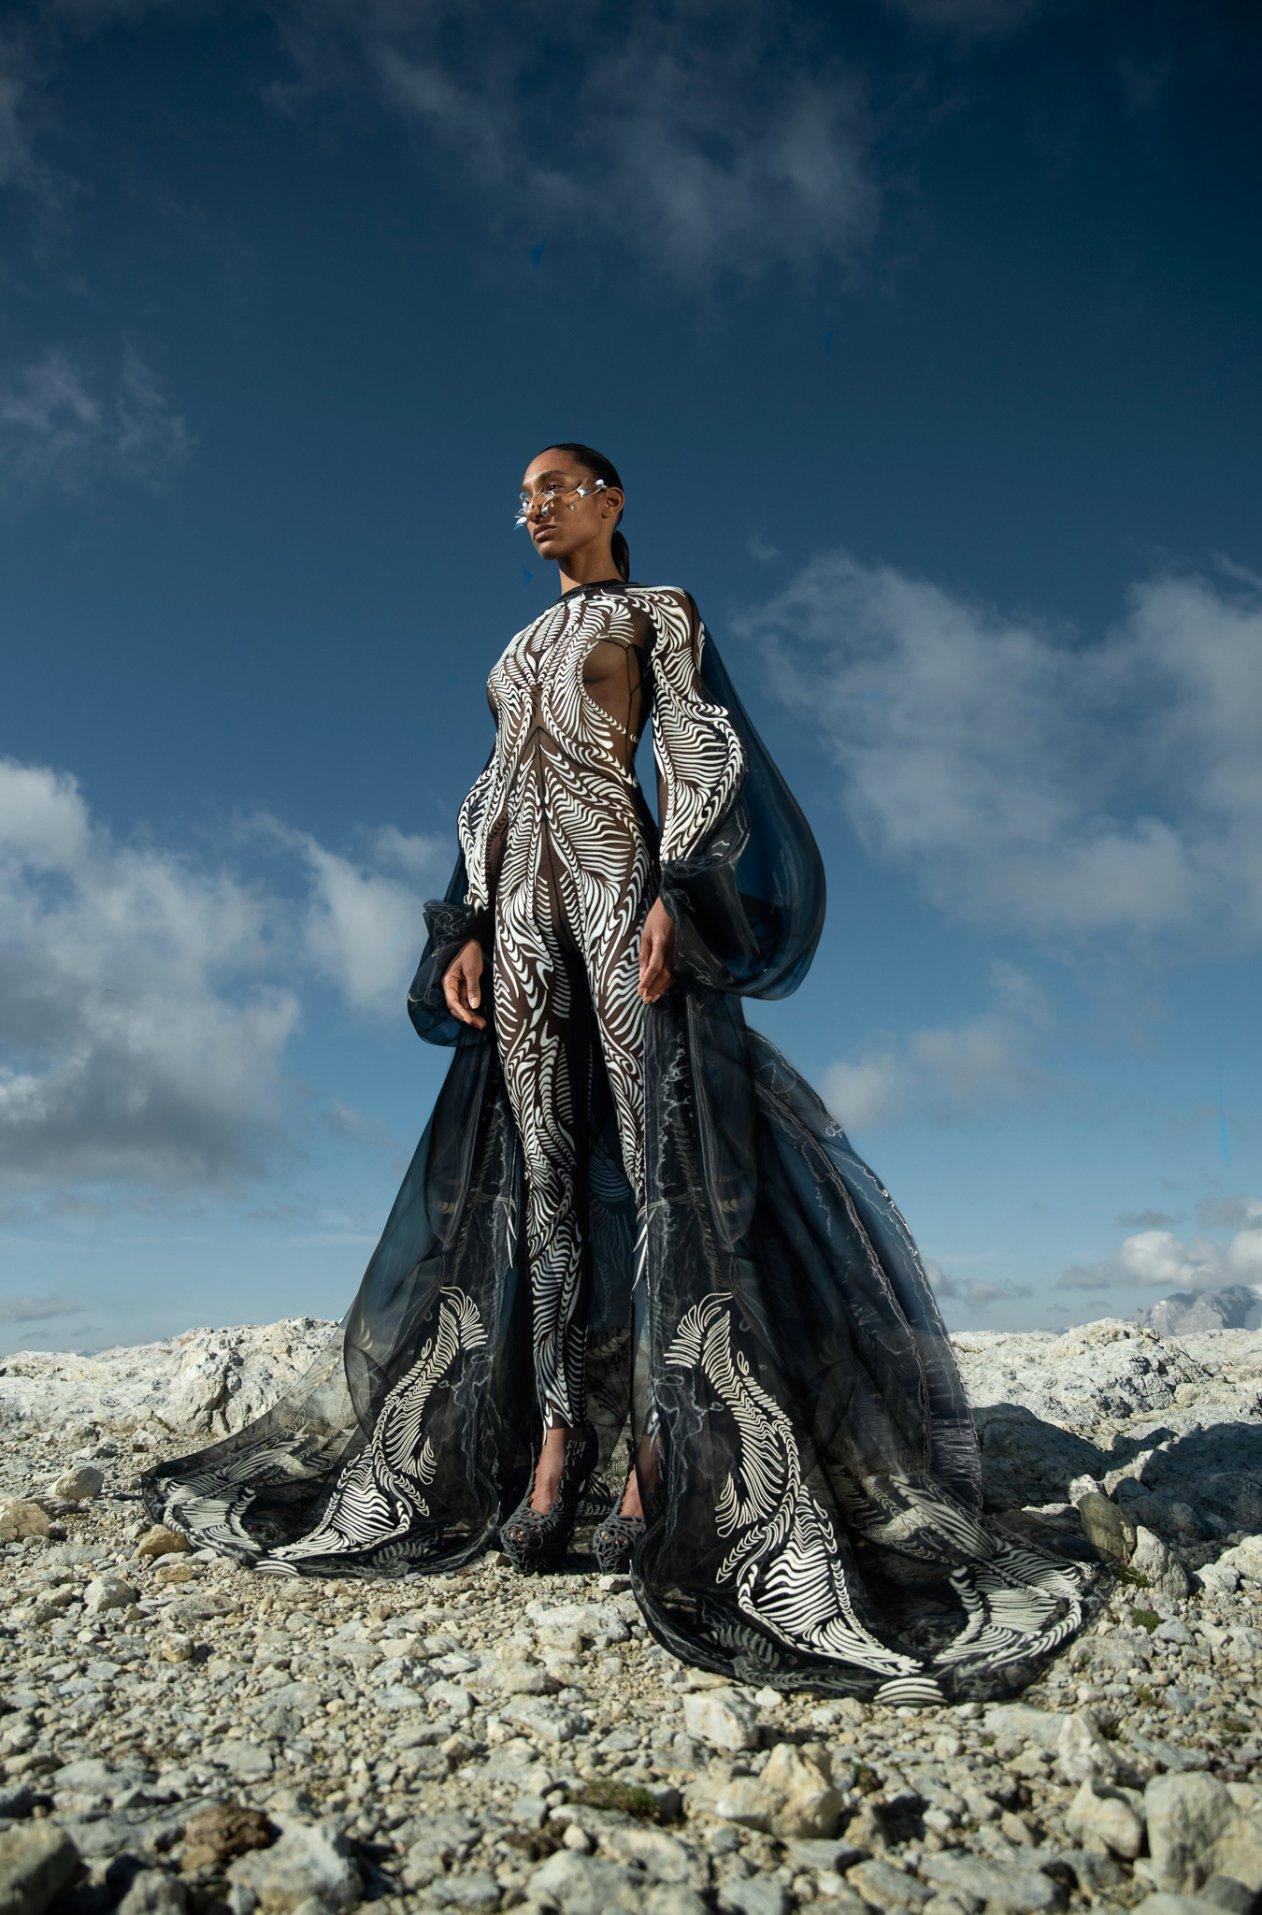 Iris-van-Herpen-AW21_22-Earthrise-Photography-by-Siermond-Nicholas-Fols